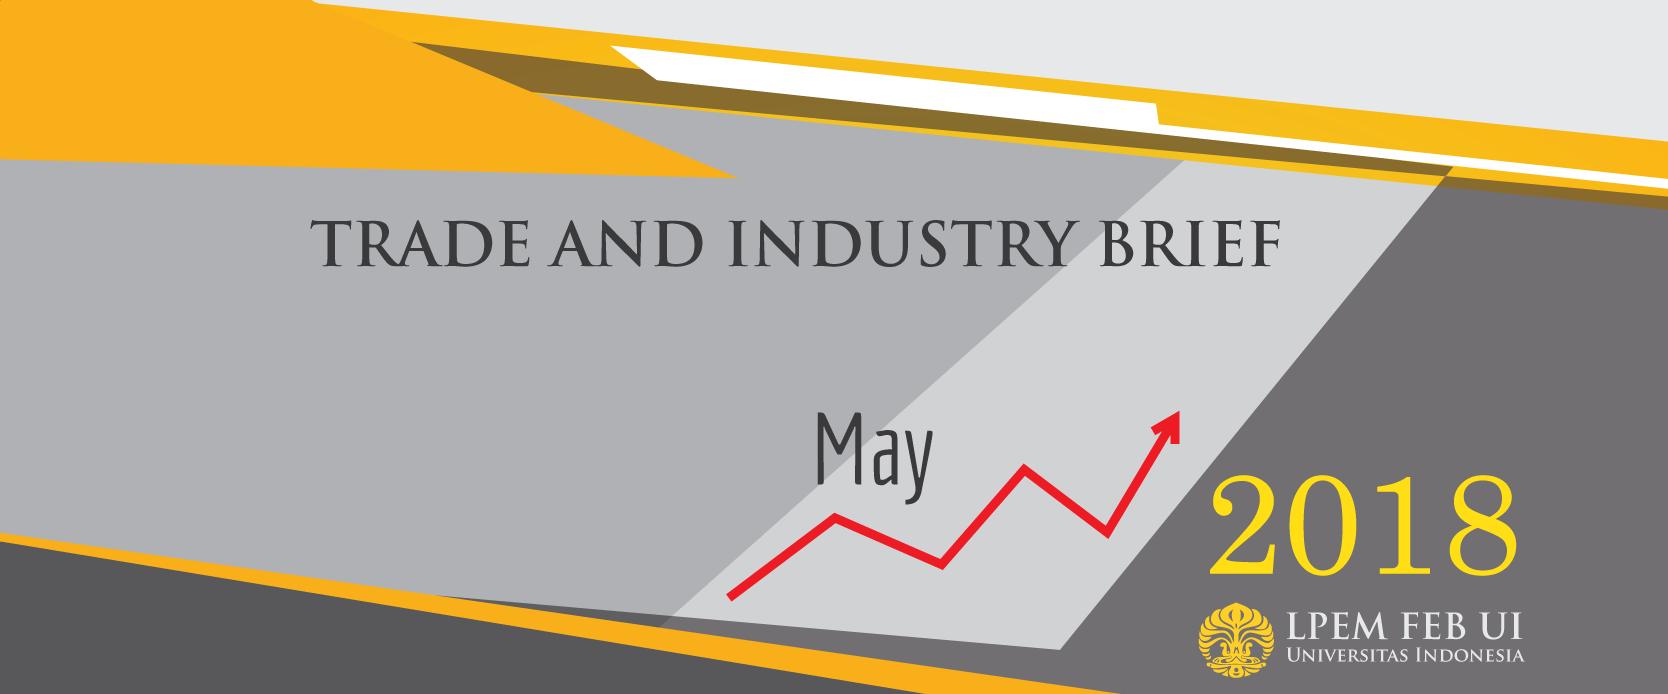 SERI ANALISIS EKONOMI: TRADE AND INDUSTRY BRIEF, Mei 2018